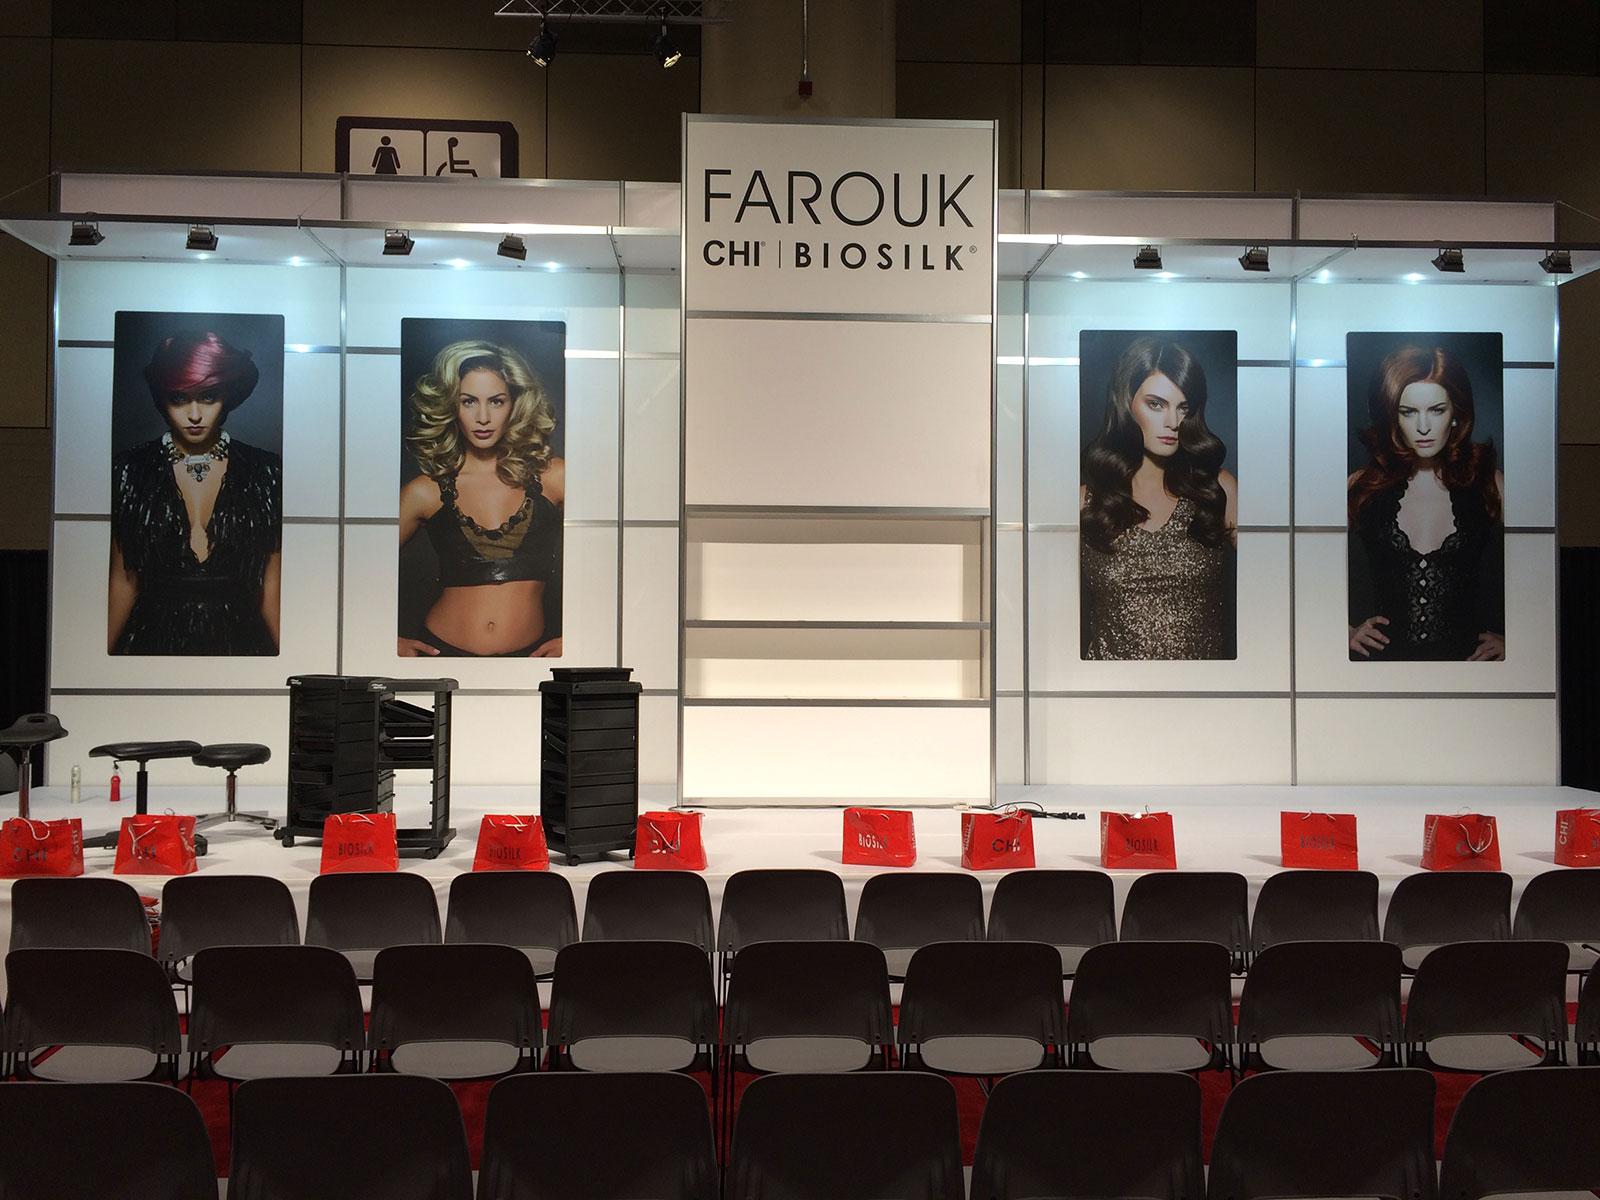 Farouk Photograph